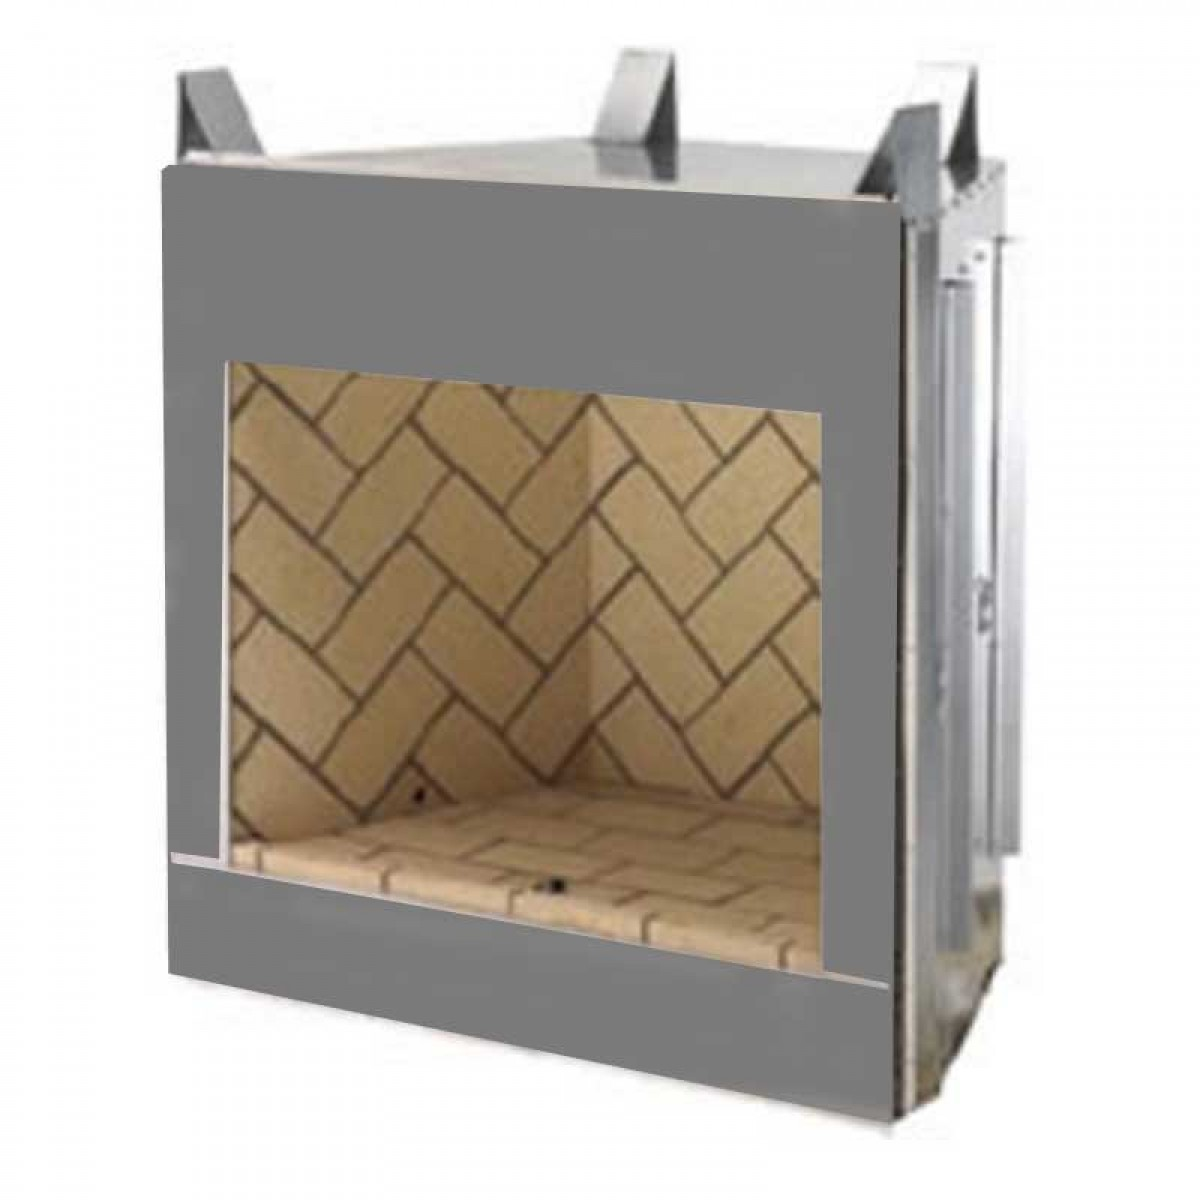 ihp superior vrt3500 universal vent free circulating gas firebox